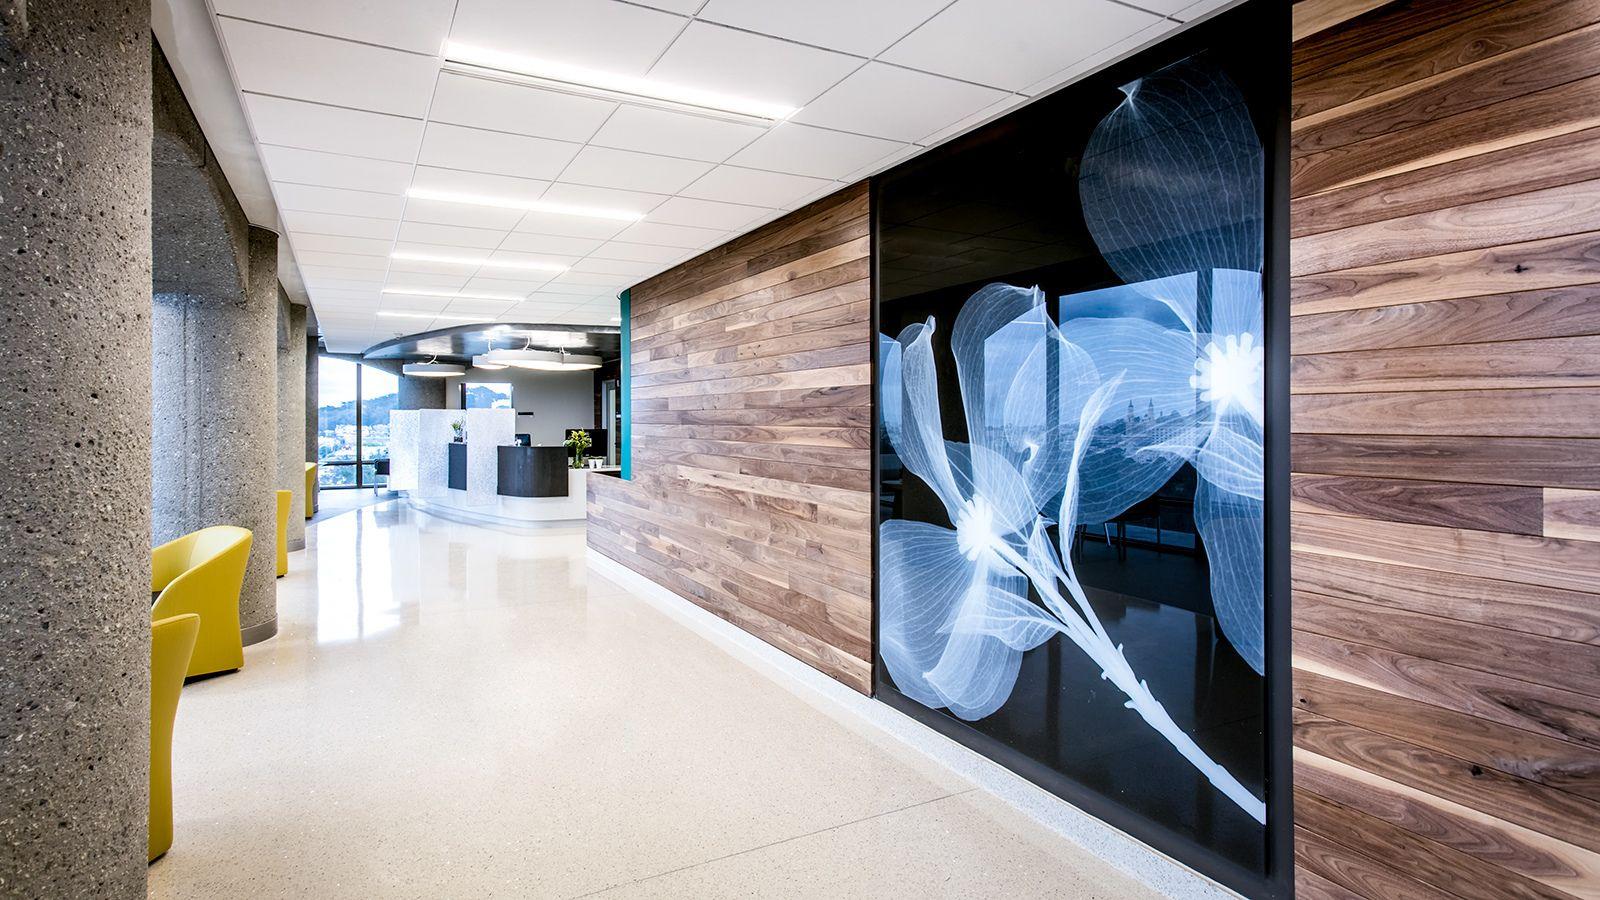 Skyline Design glass installation at UCSF featuring Botanica Dogwood